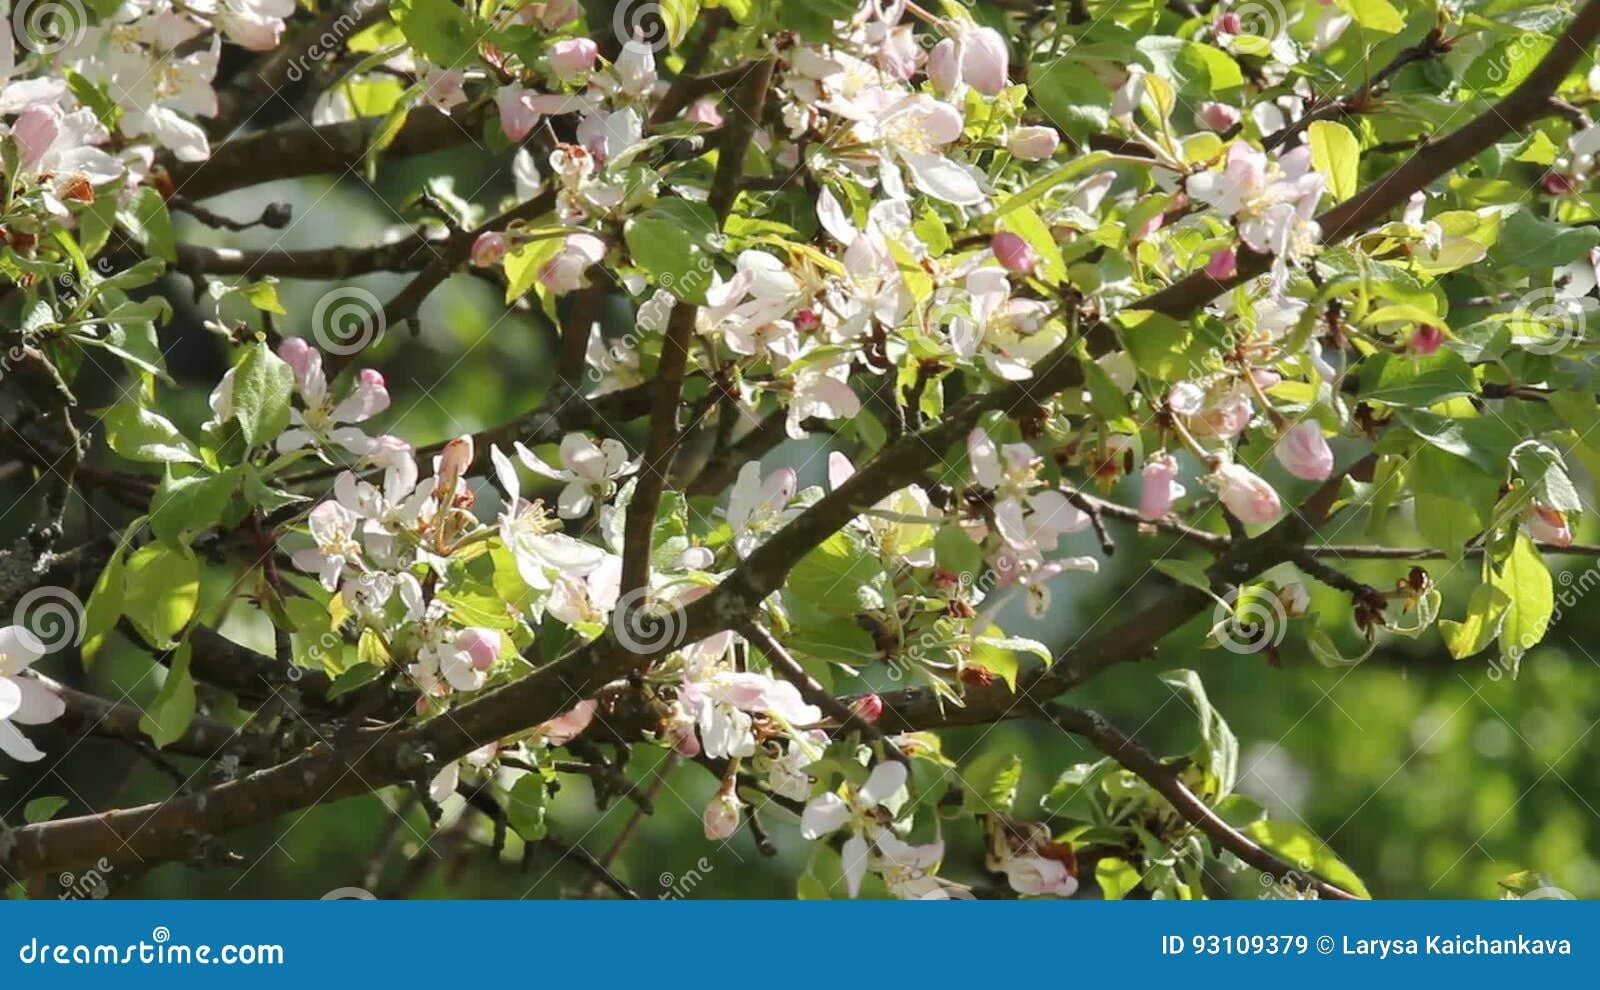 The pear tree blooms white flowers lush flowering gardens stock the pear tree blooms white flowers lush flowering gardens stock video video of color flower 93109379 mightylinksfo